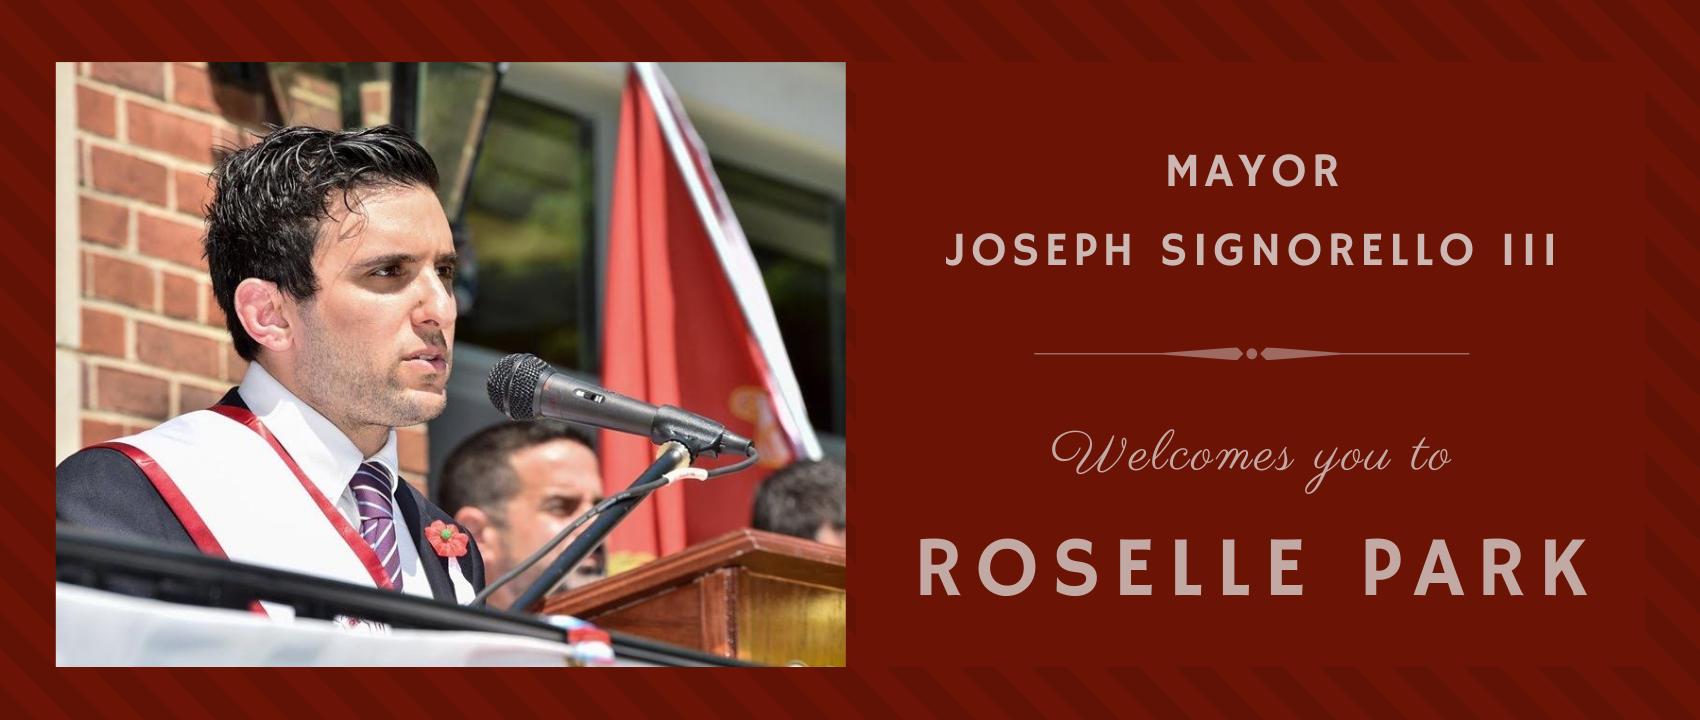 Mayor Joseph Signorello III Welcomes you to Roselle Park